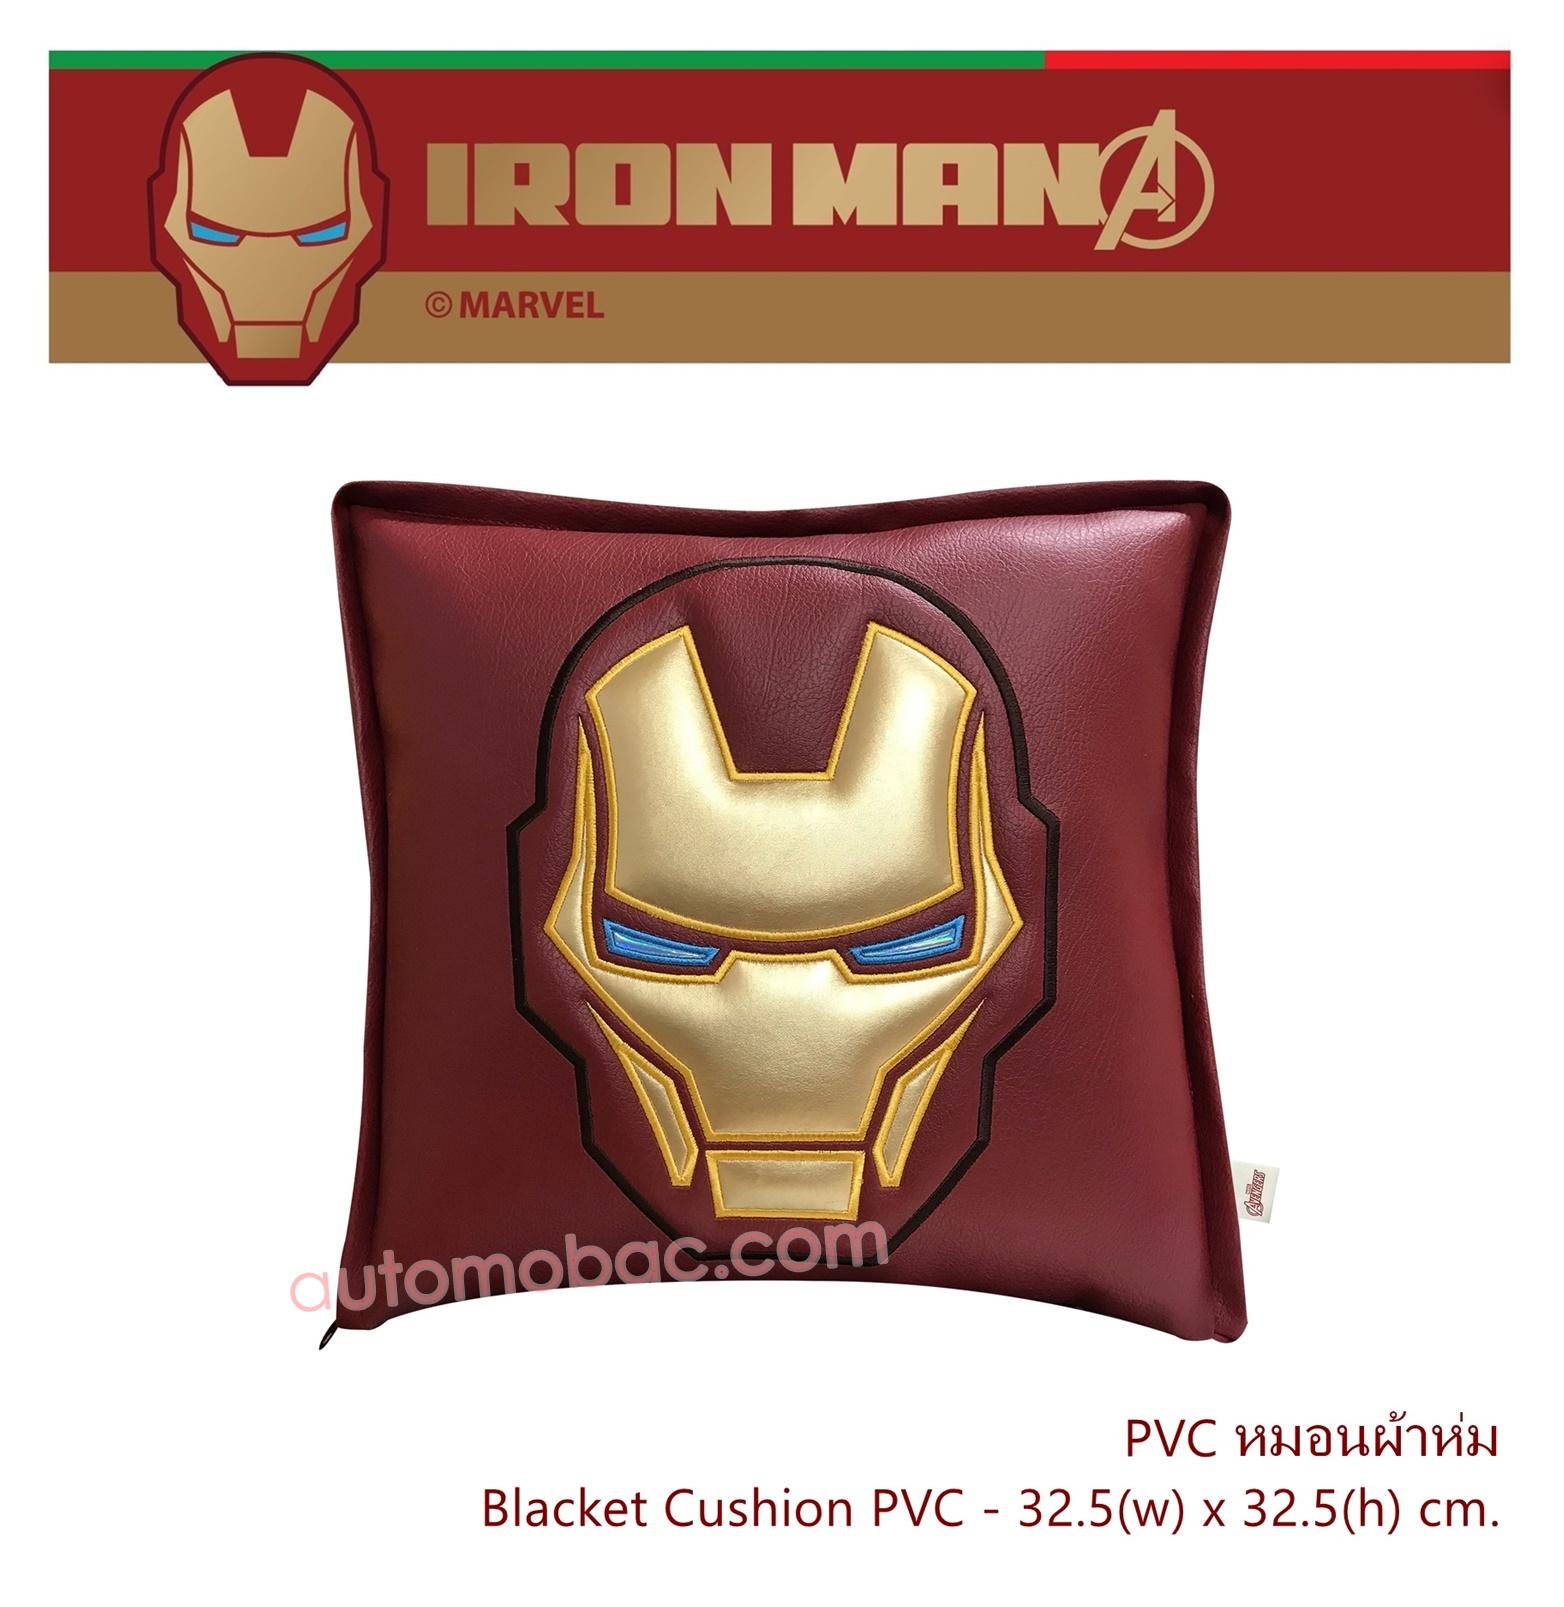 IRON-MAN หมอนผ้าห่ม 2 in 1 ผลิตจาก PVC เกรด A ขนาดประมาณ 85 x 140 cm. ใช้ได้ทั้งในรถ และในบ้าน